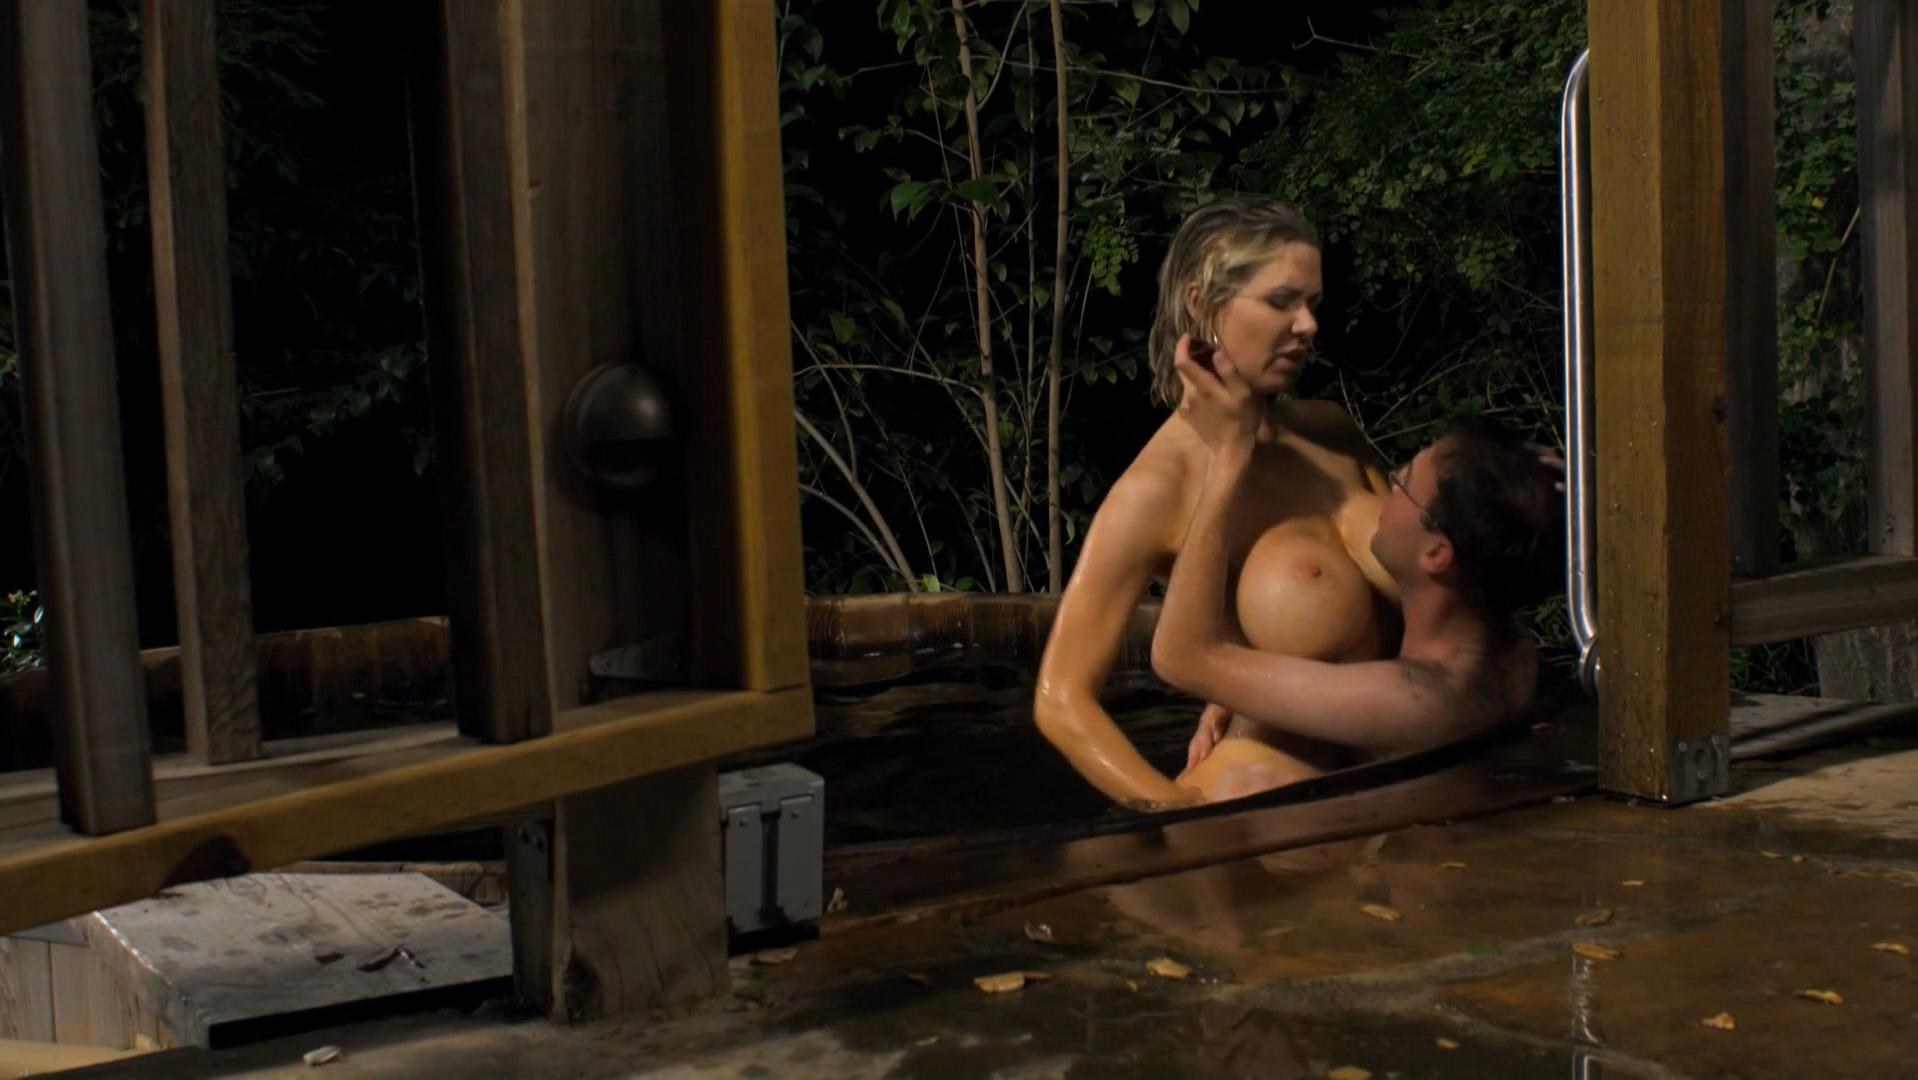 Milf Nude Video photo 21